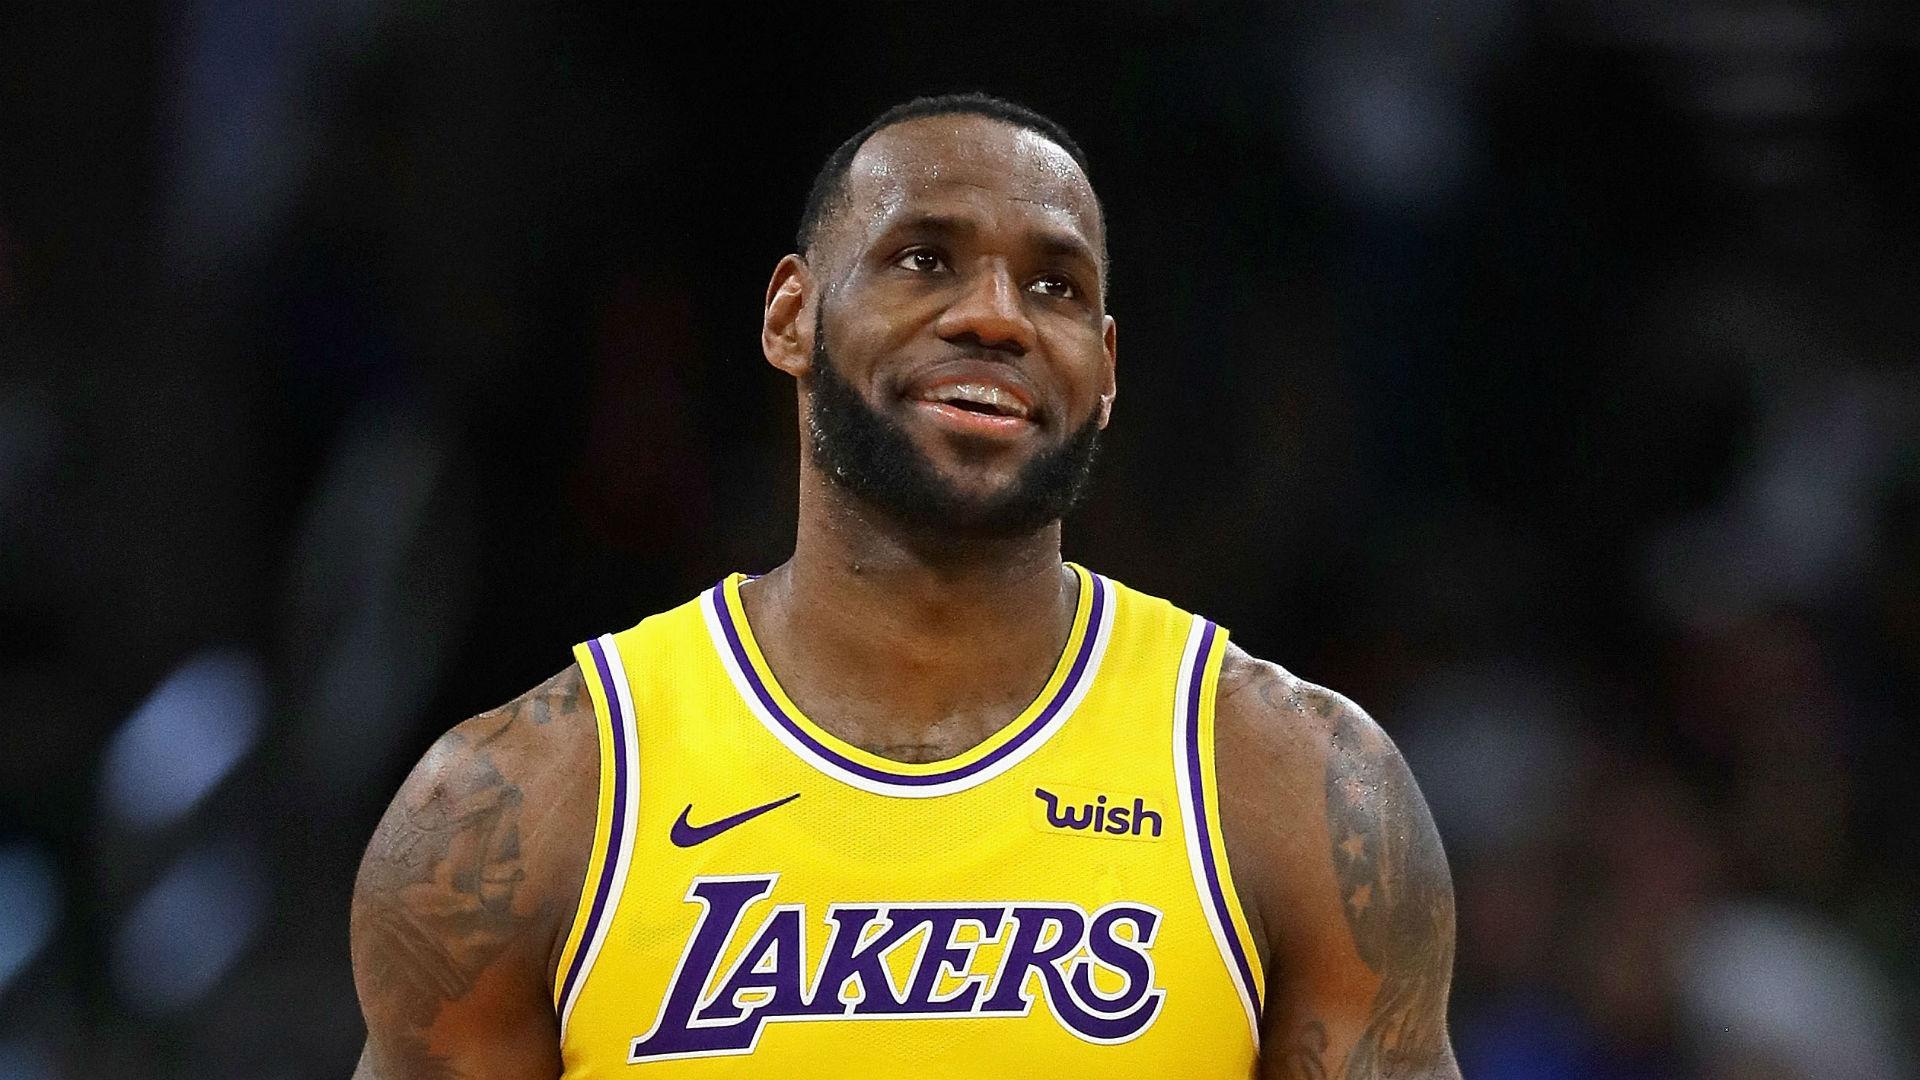 Richard Jefferson believes LeBron James is set to have a stellar NBA season.